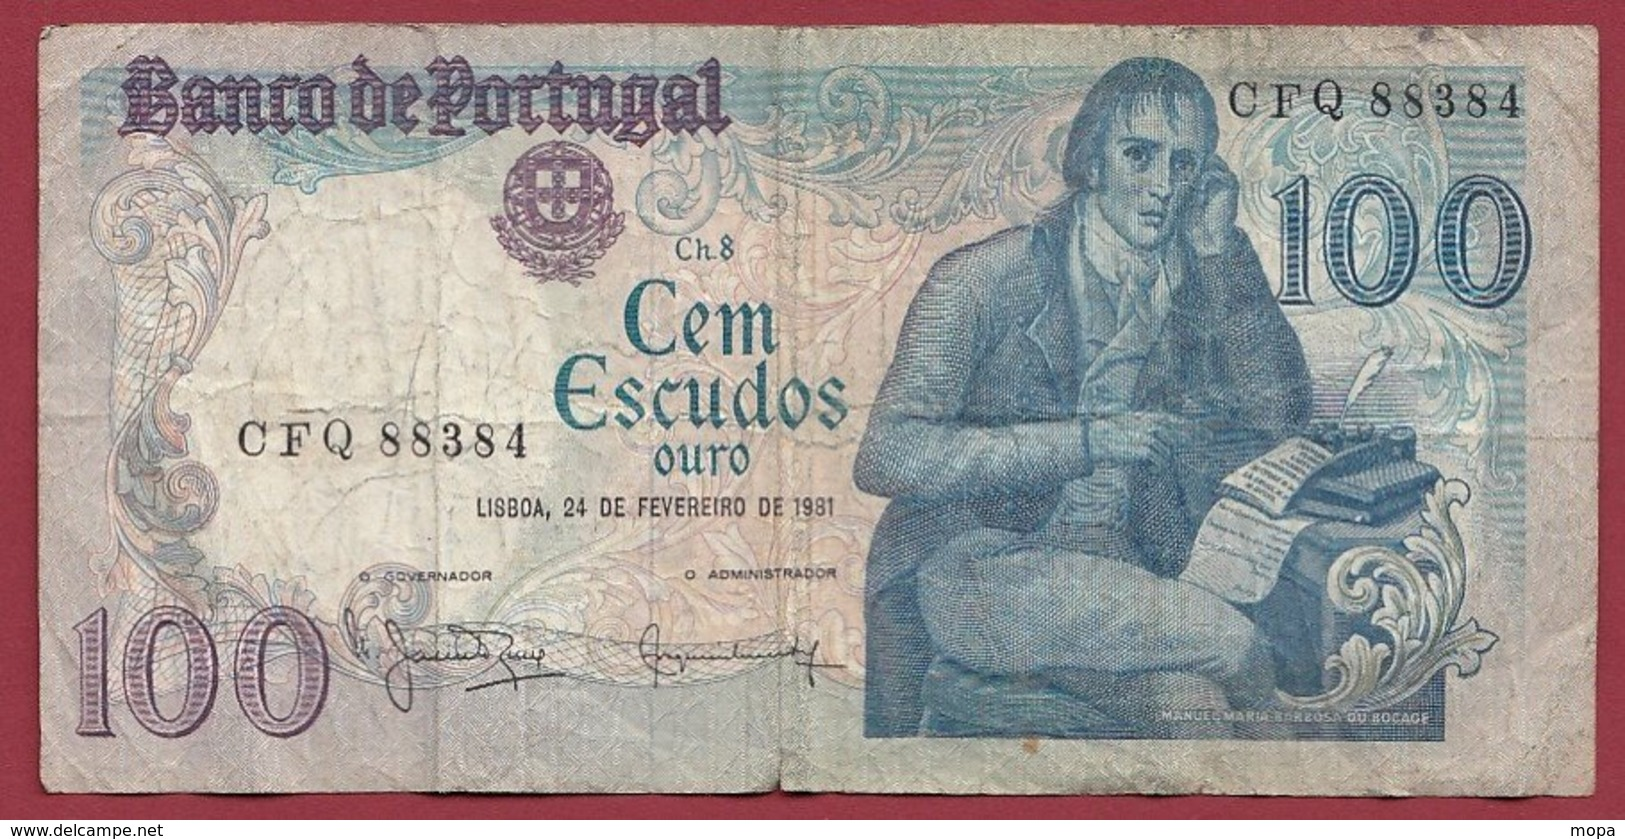 Portugal 100 Escudos Du 24/02/1981  Dans L 'état (13) - Portugal